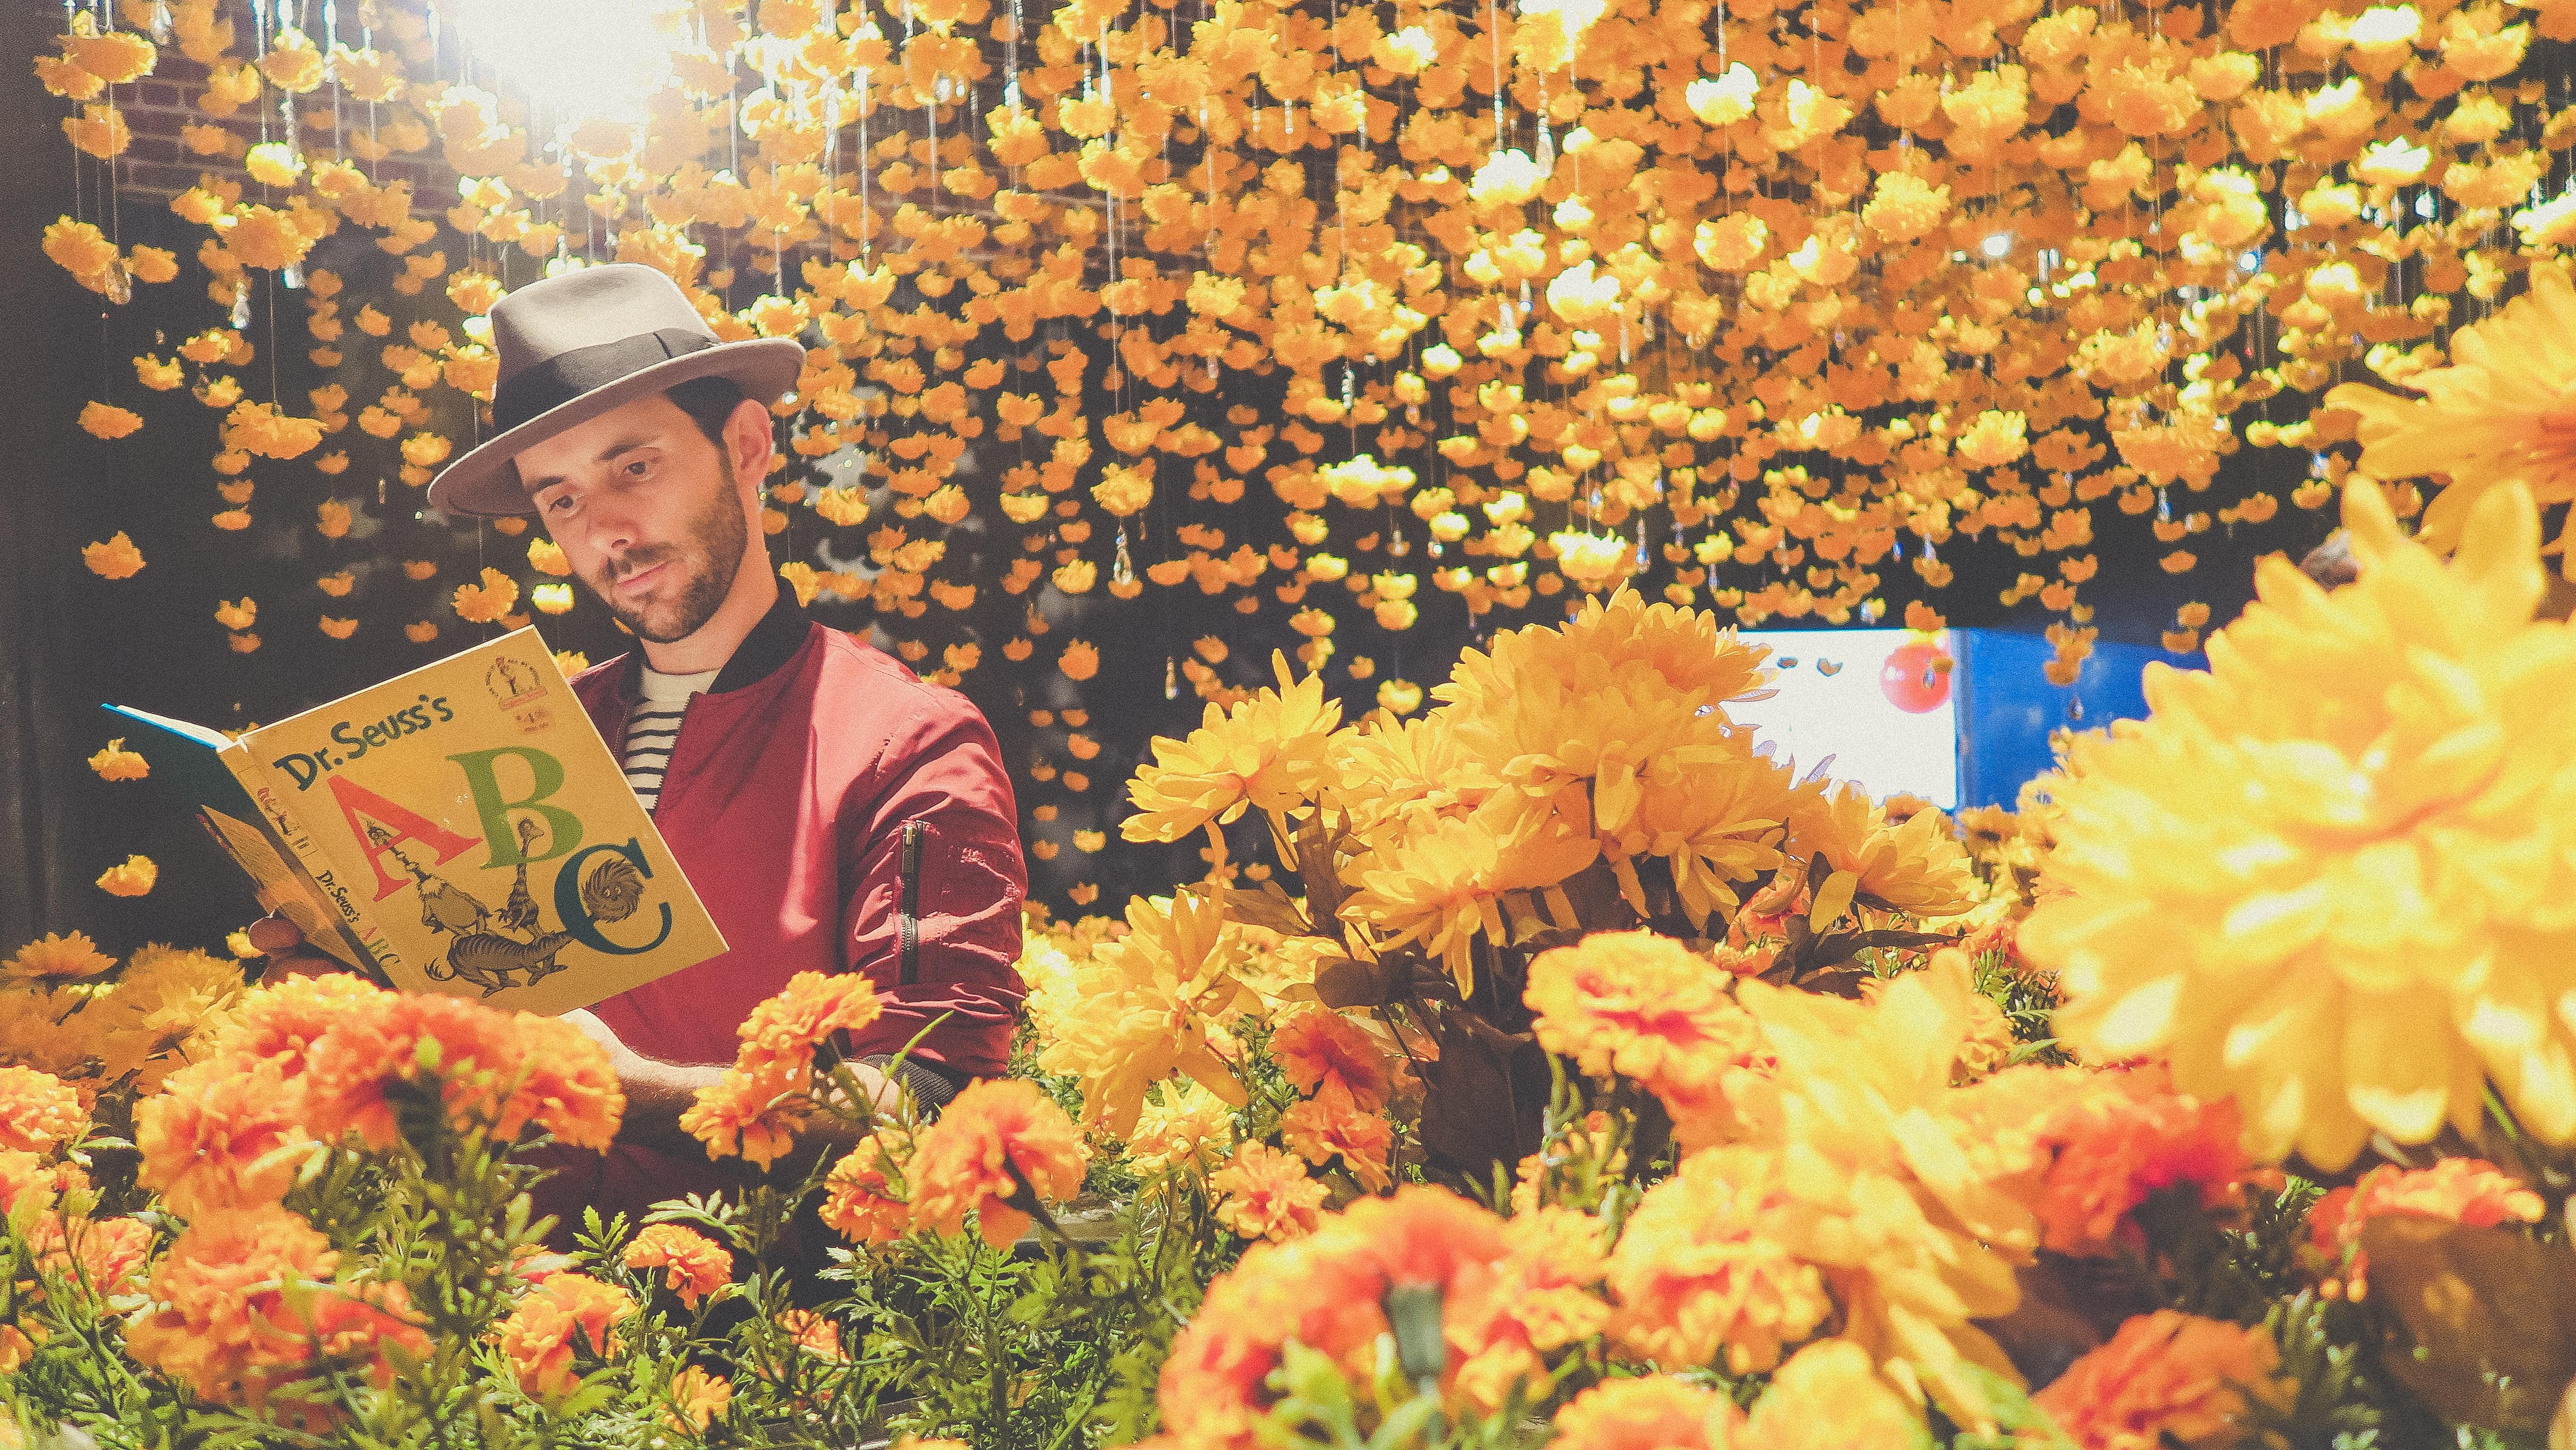 man reading book near yellow flowers